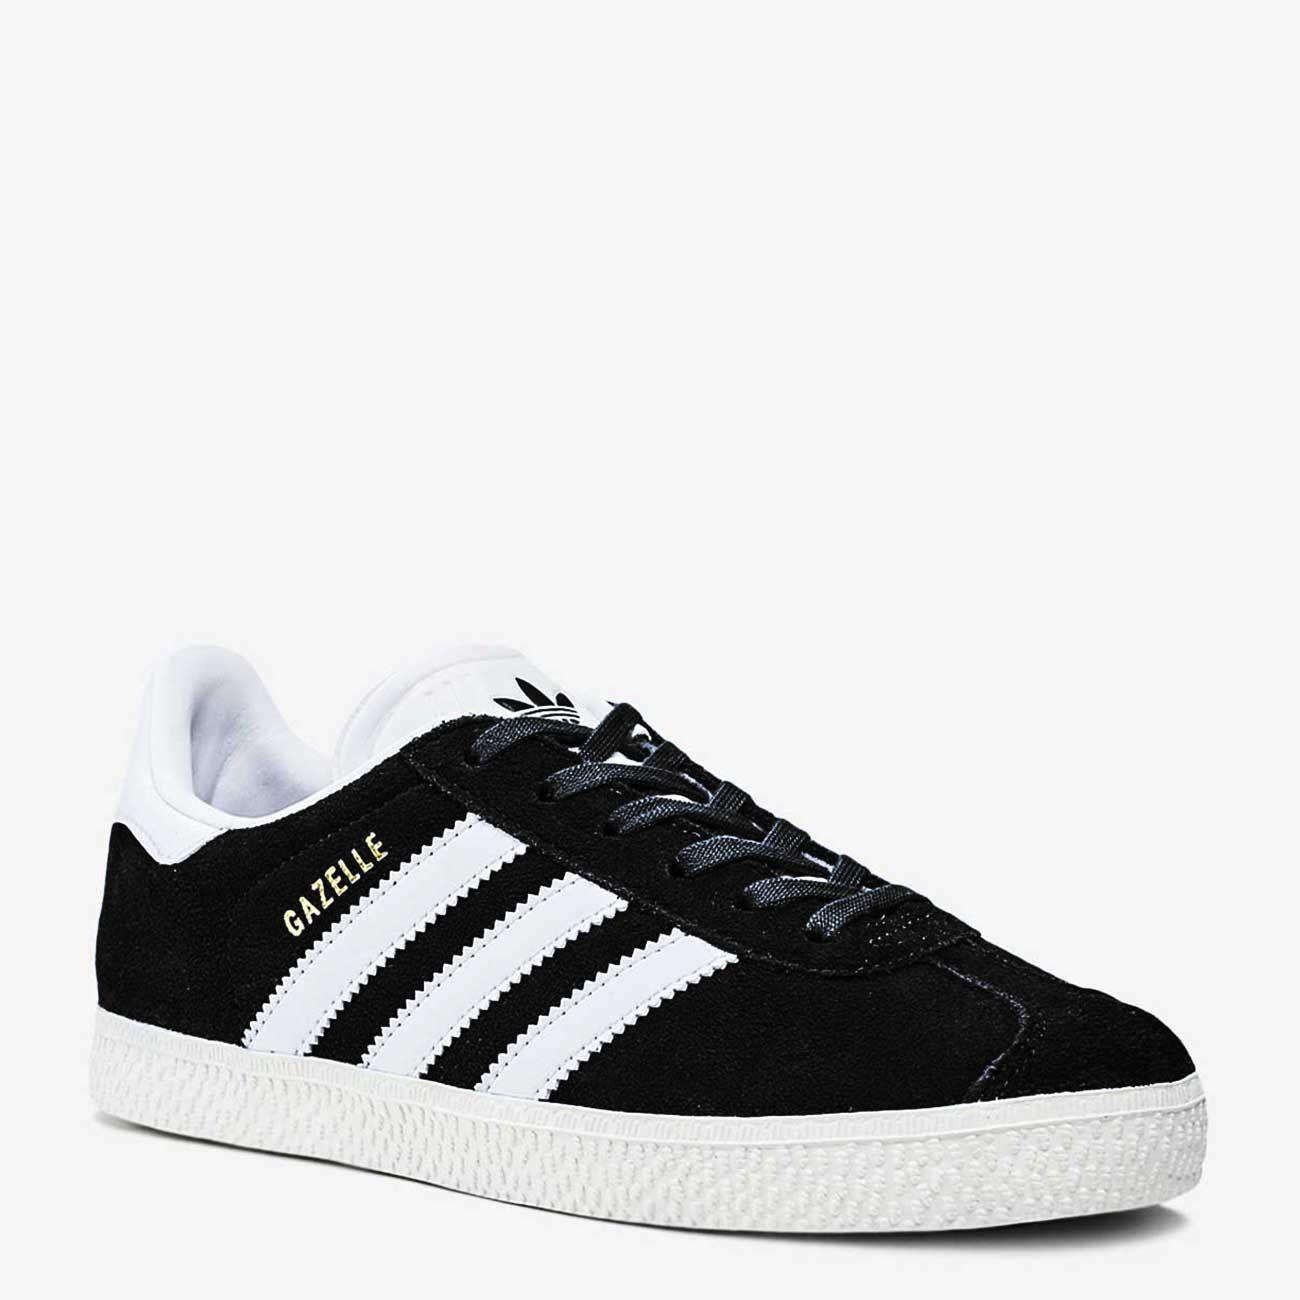 be23d3dc9fd Sapatilhas Adidas Gazelle